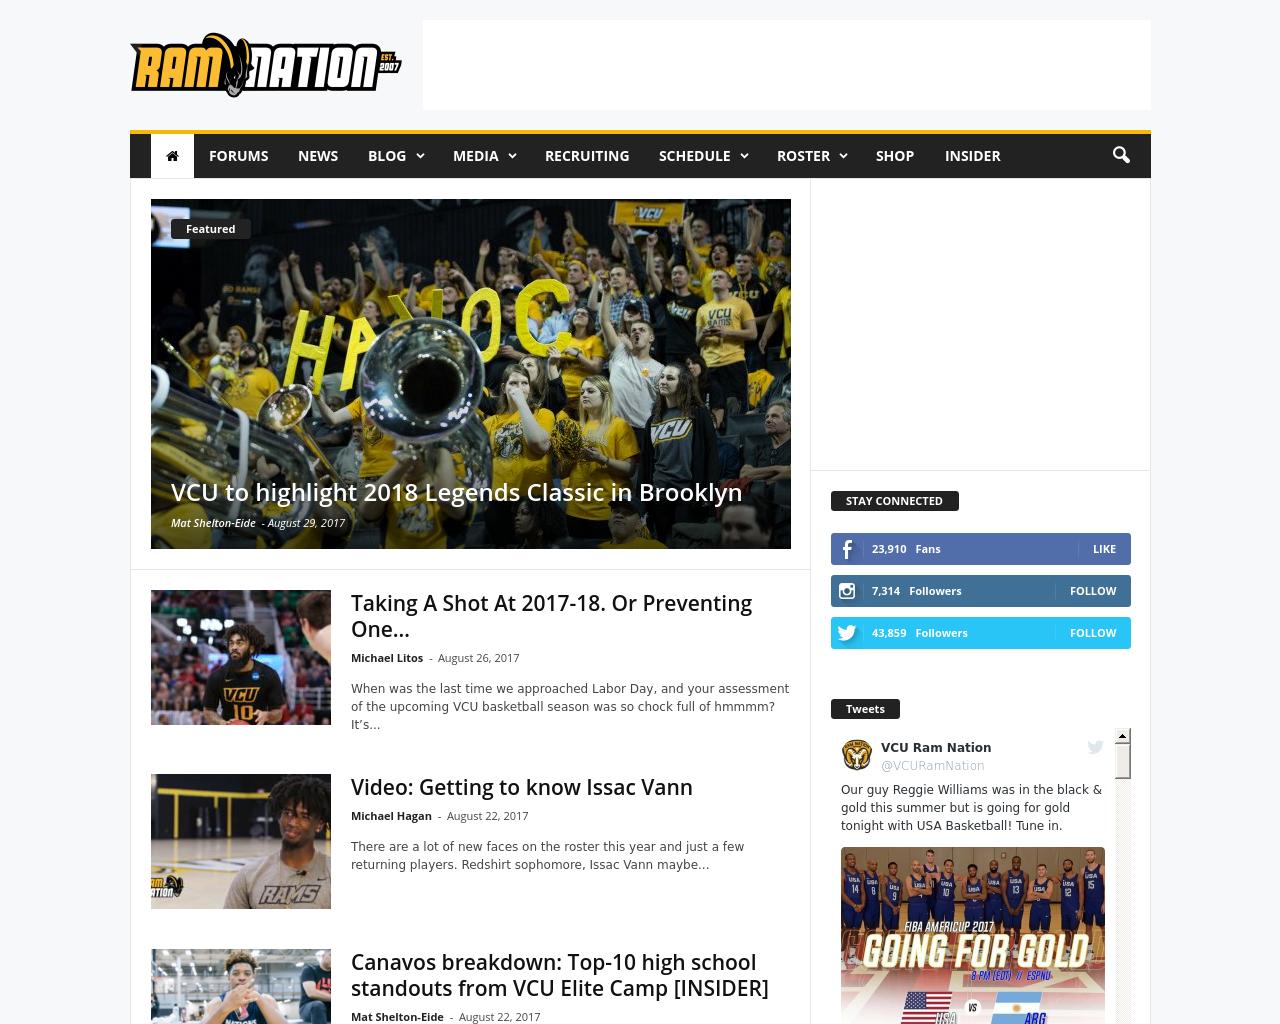 Vcu Ram Nation Advertising Mediakits Reviews Pricing Traffic